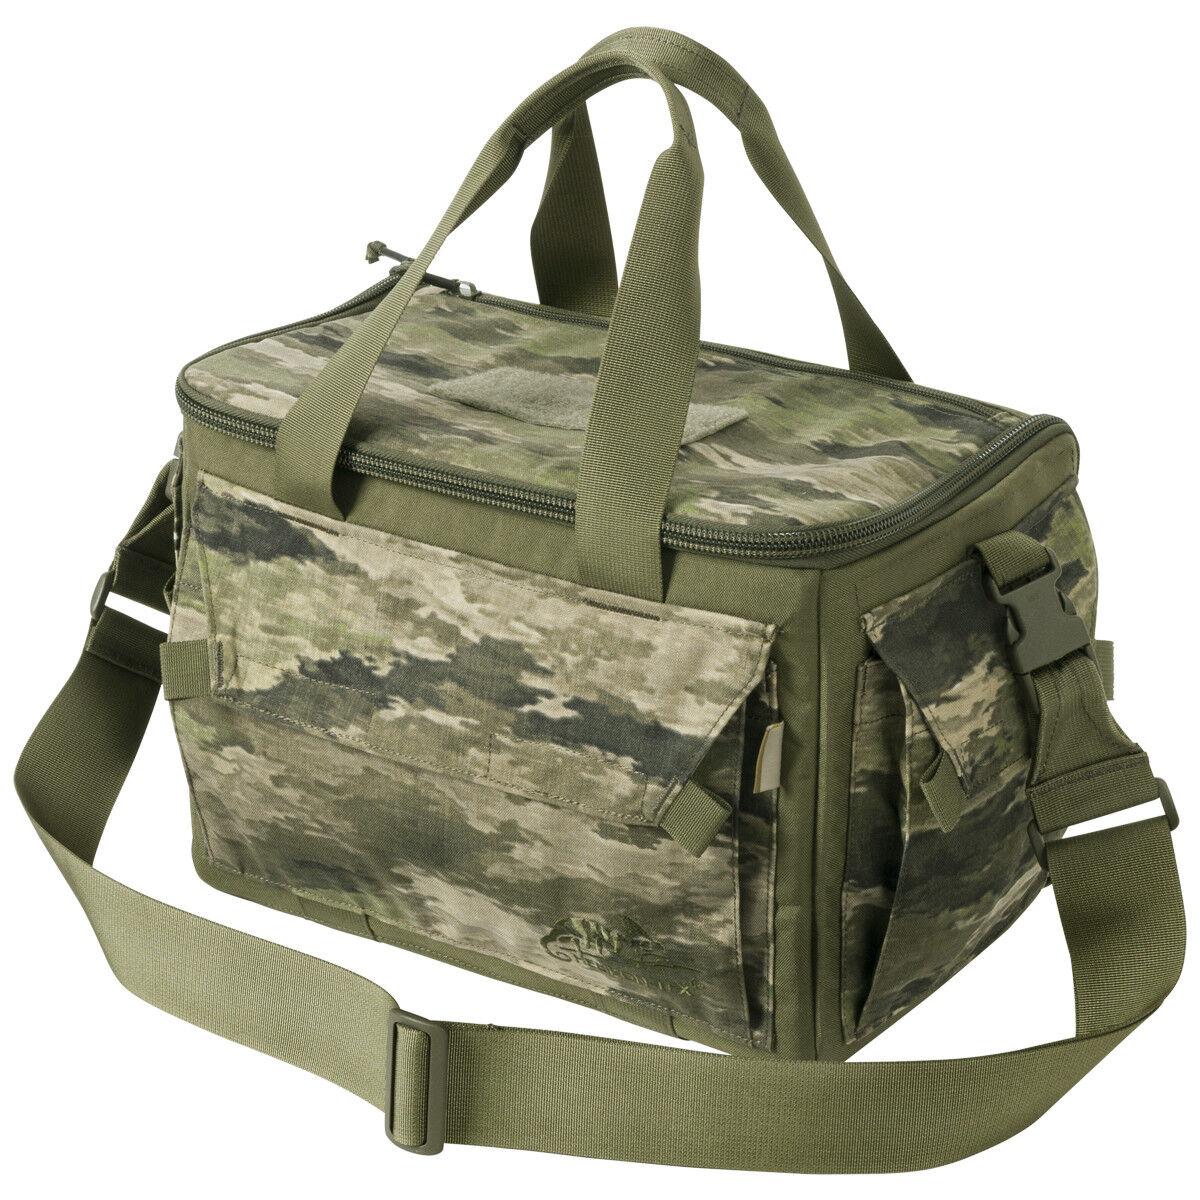 Helikon Range Bag Tactical Army Airsoft Shooting Ammo Mag Carrier A-TACS iX Camo